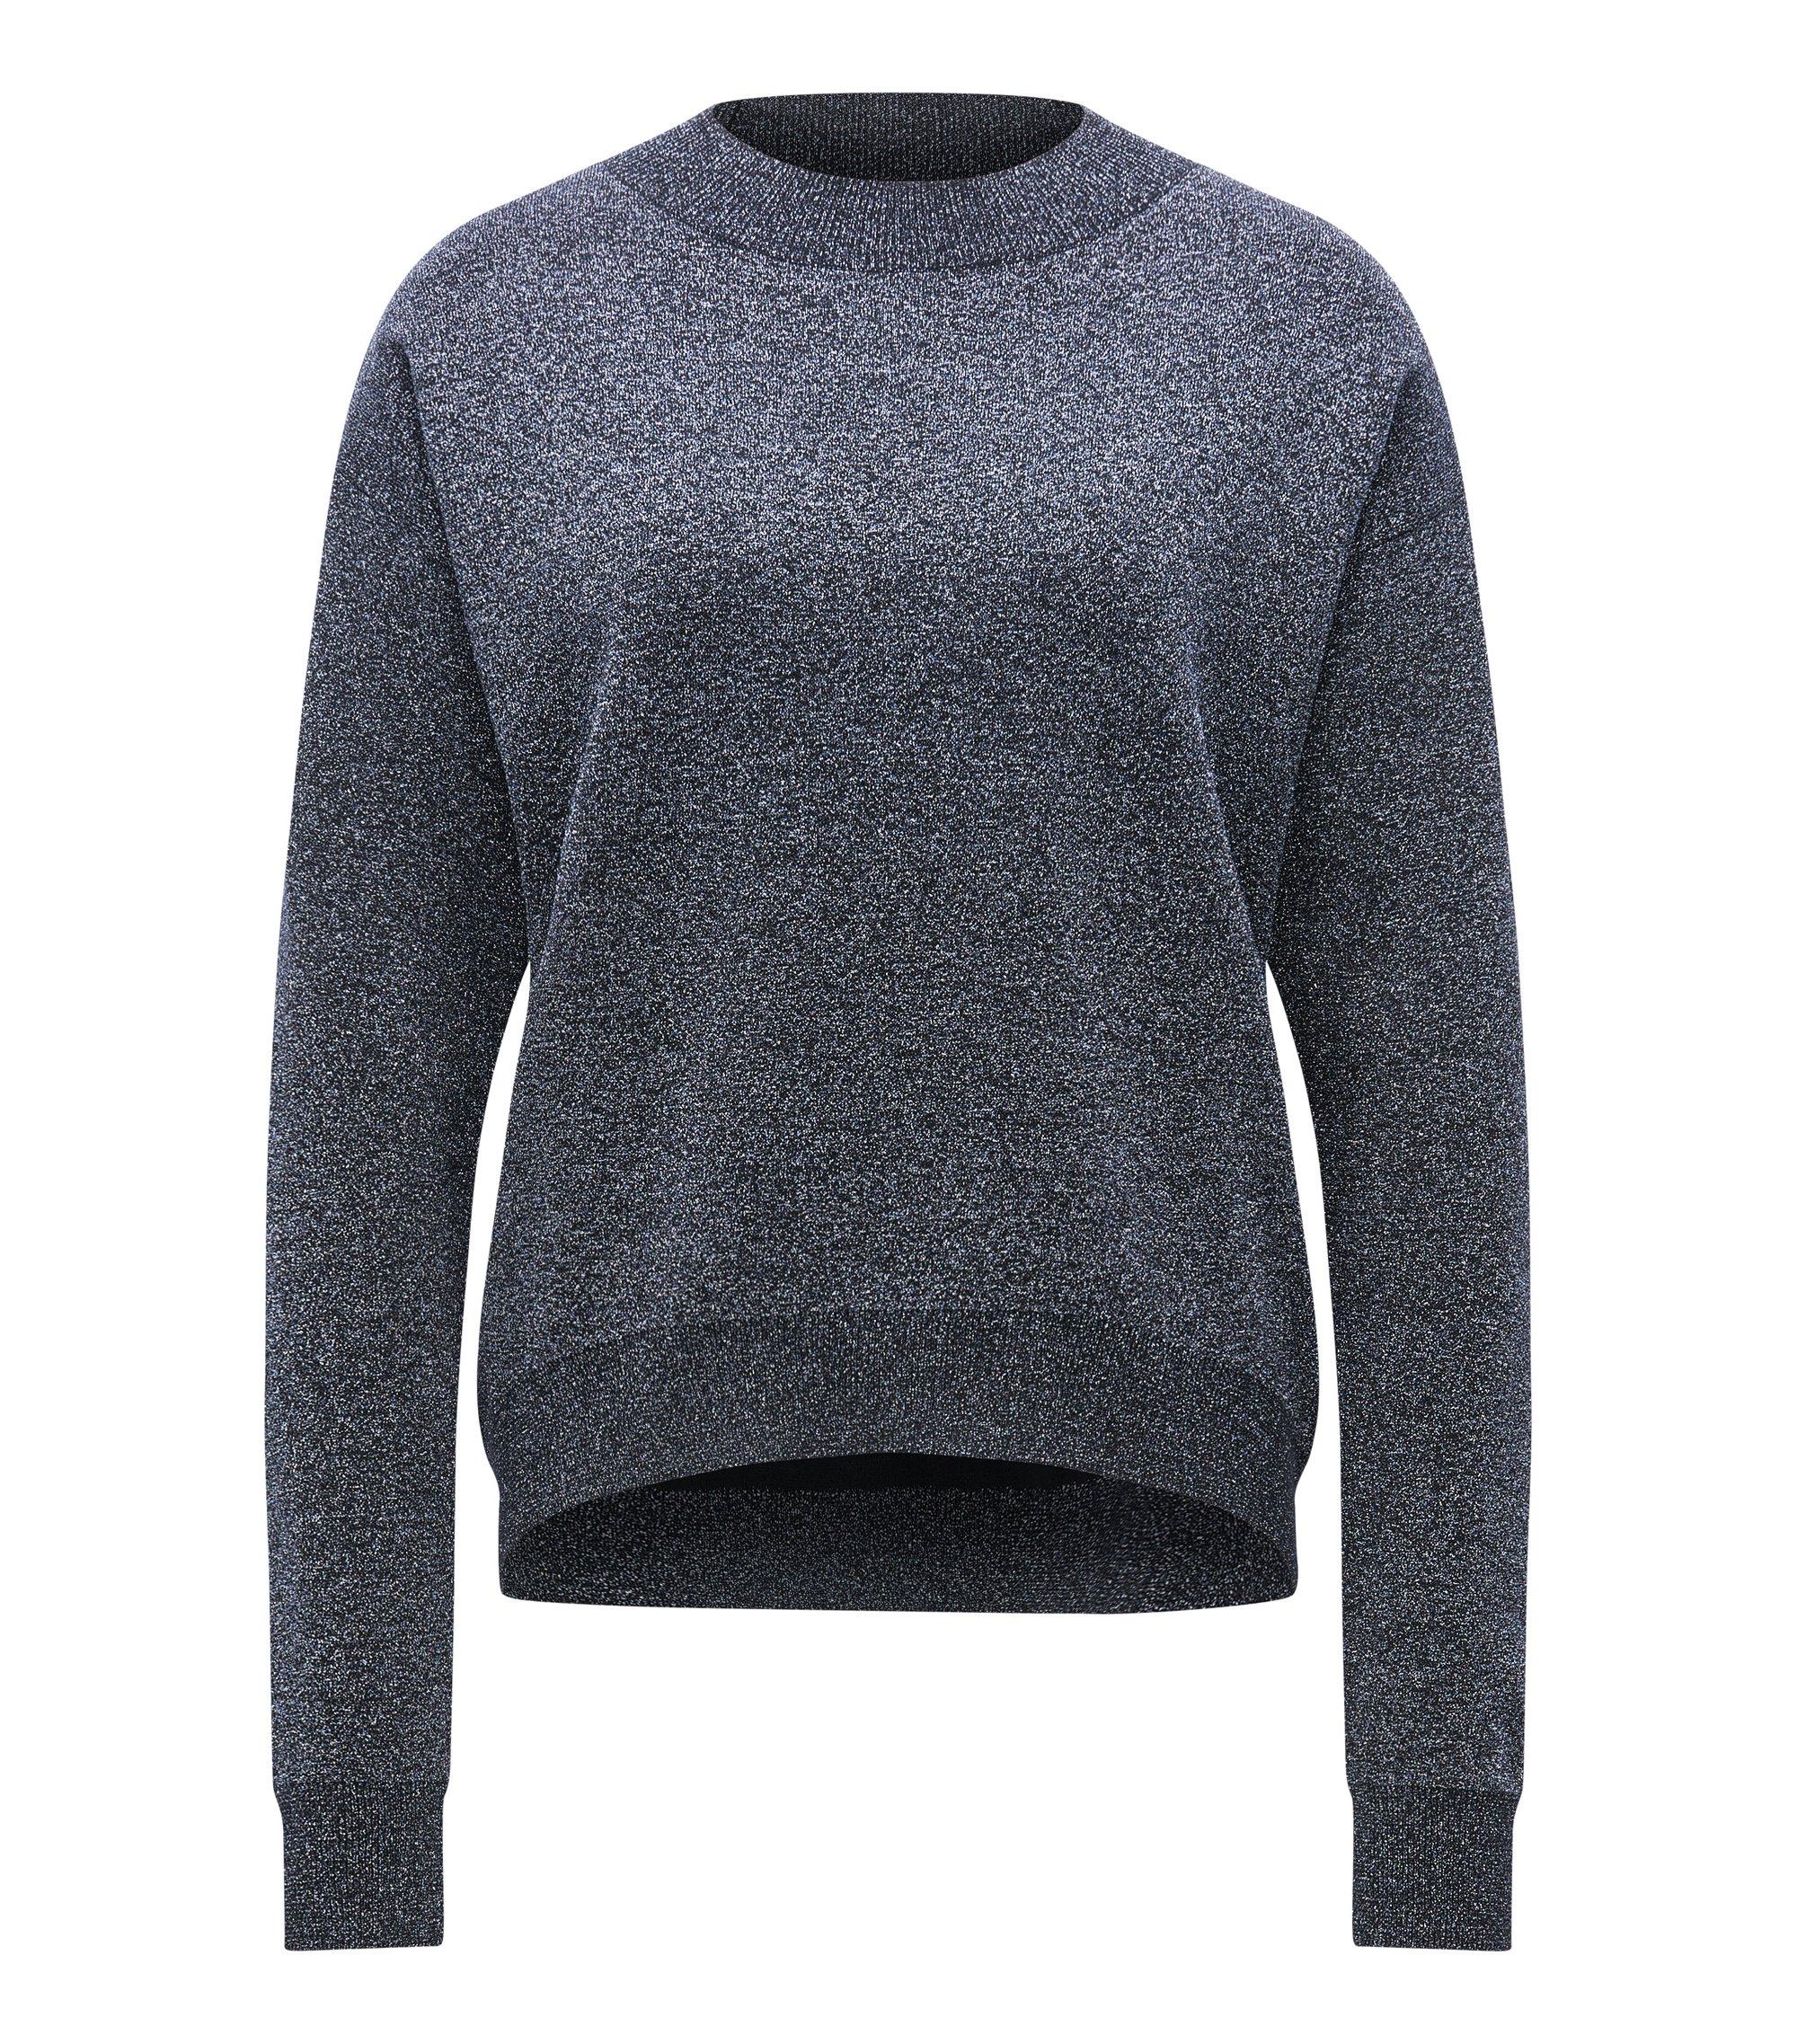 Crew-neck sweater in a metallic virgin wool blend, Dark Blue